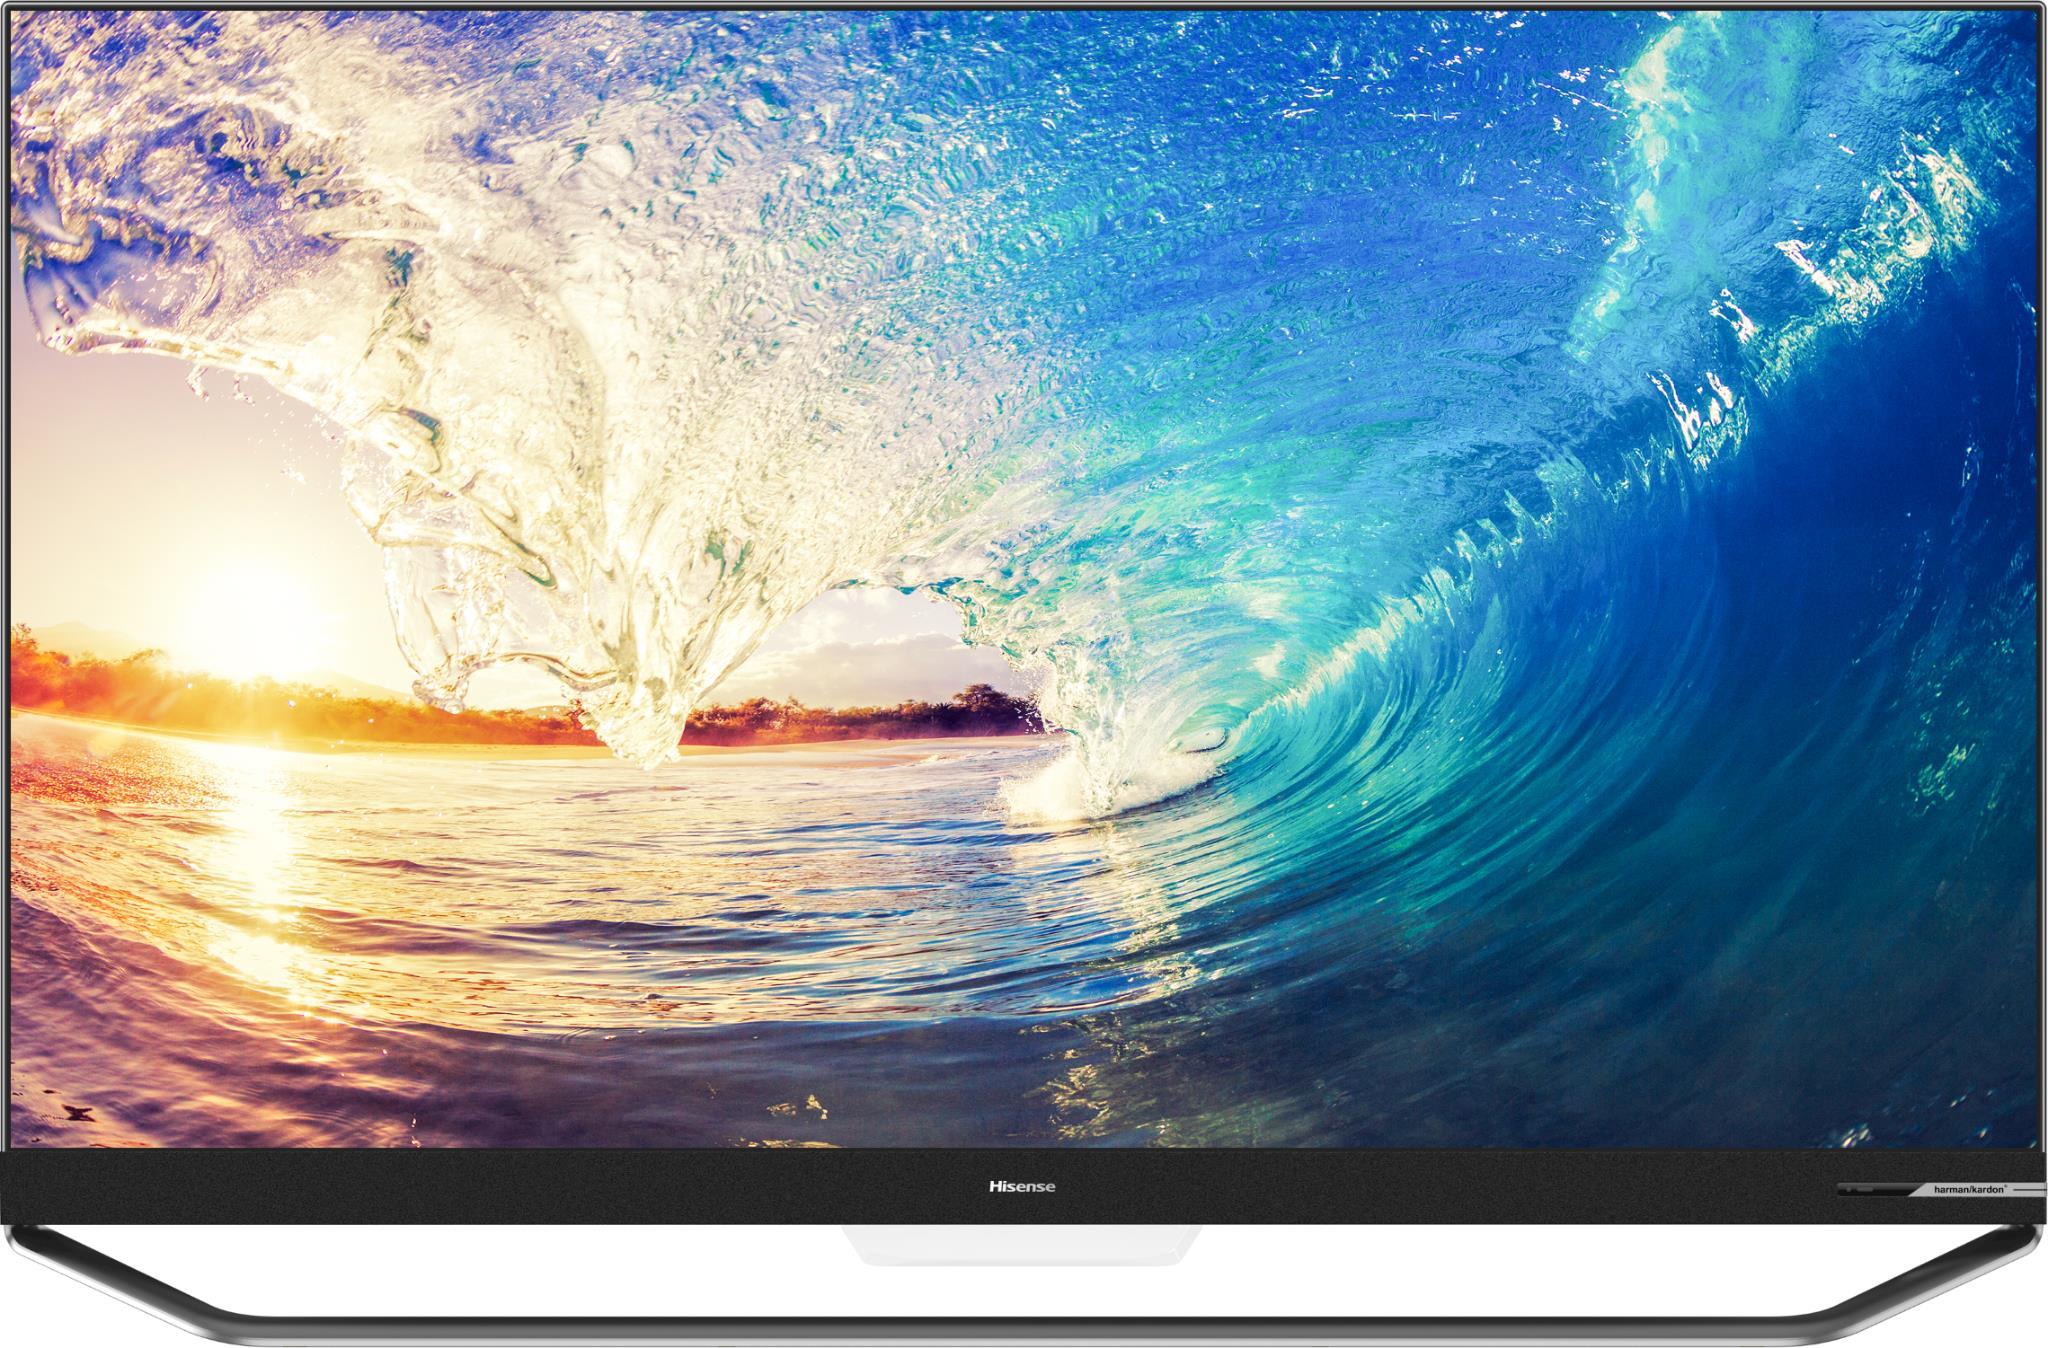 Jb Education Hisense Premium P9 65 Series 9 4k Uhd Smart Uled Tv